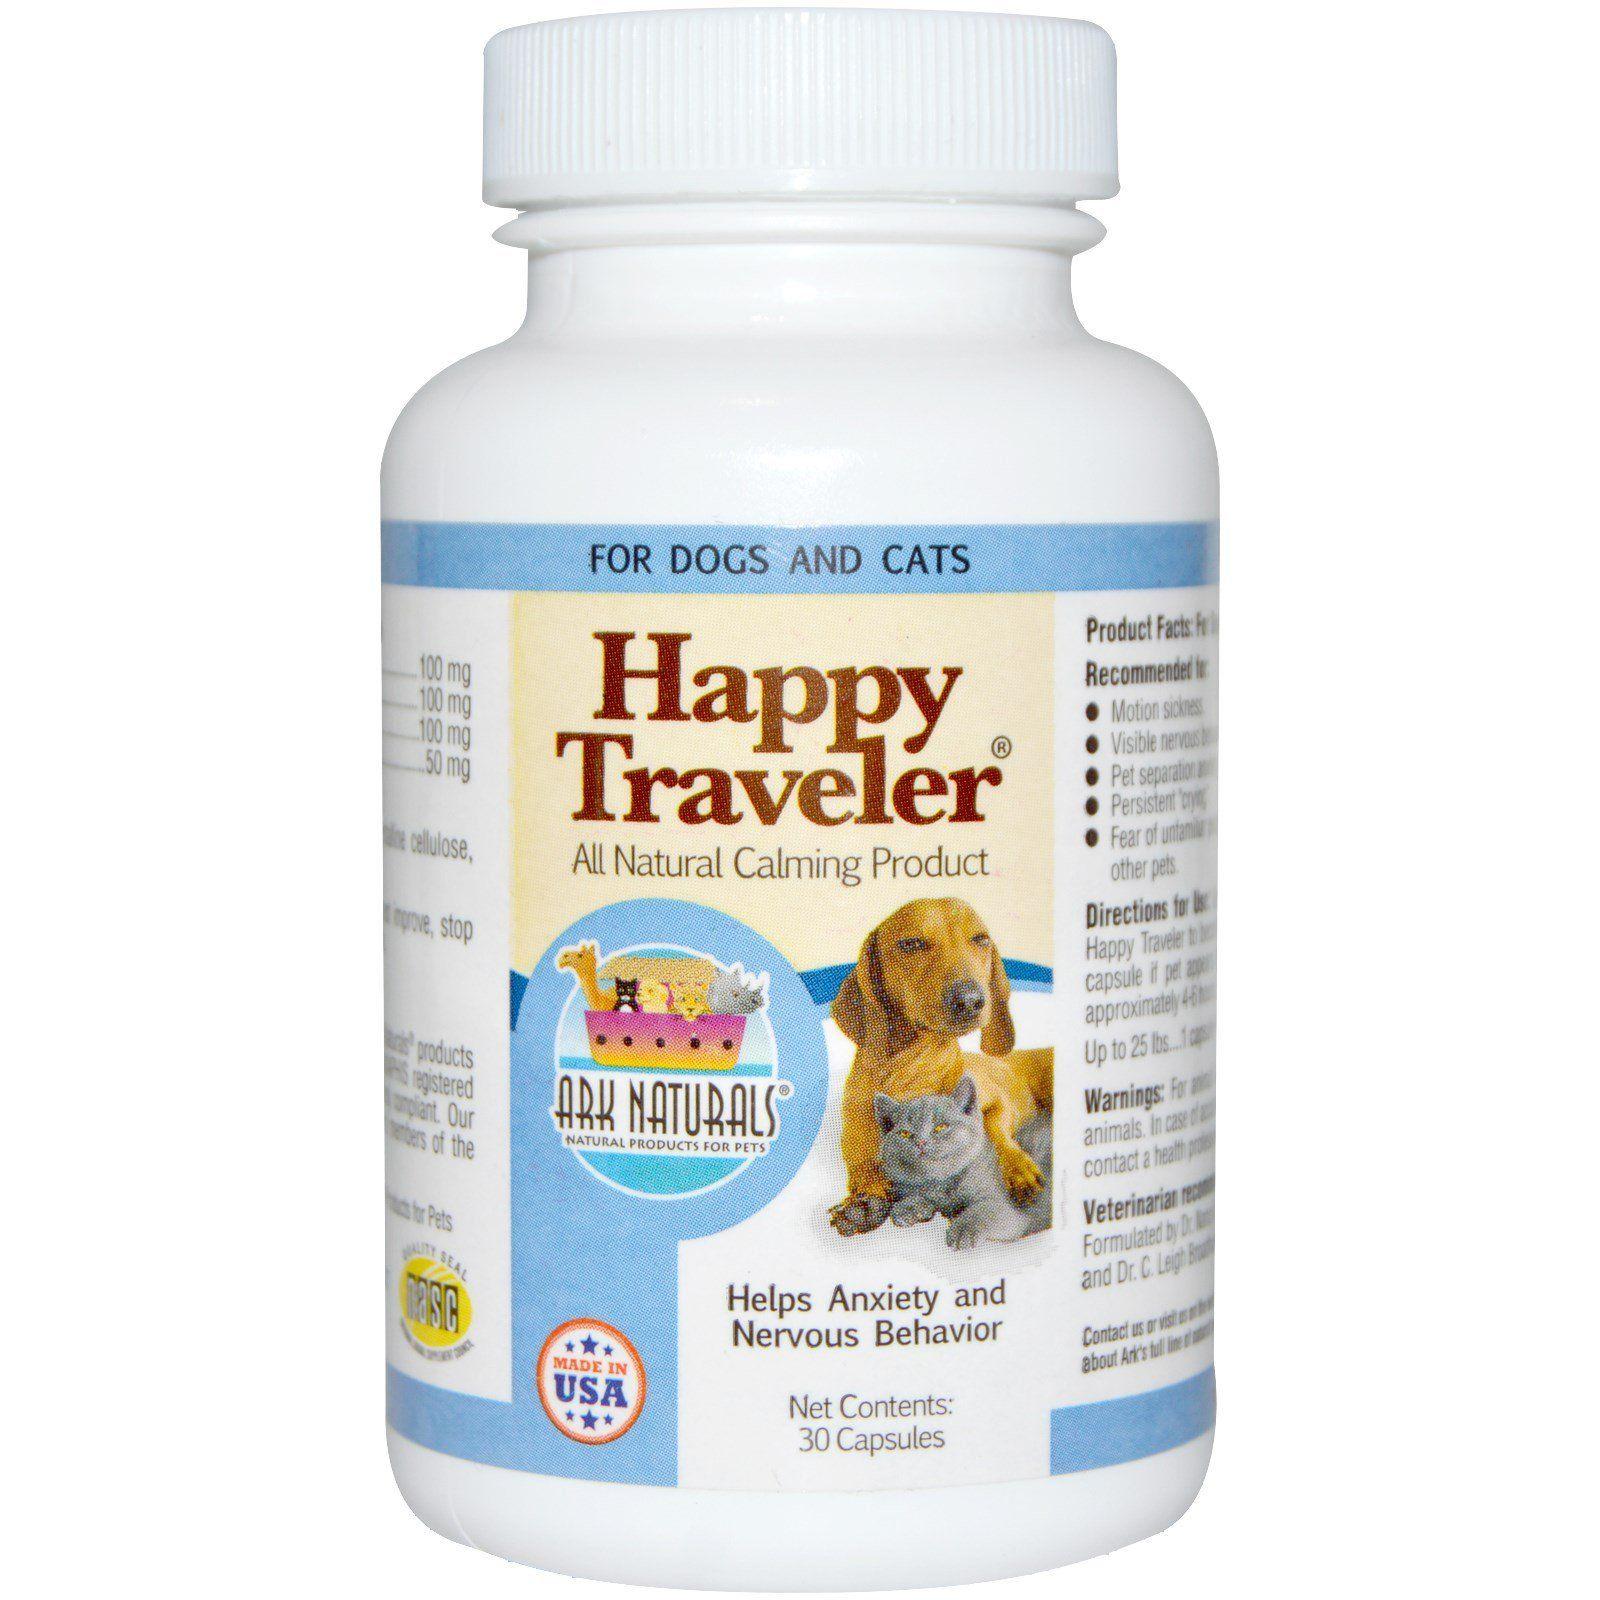 Ark naturals happy traveler all natural calming product